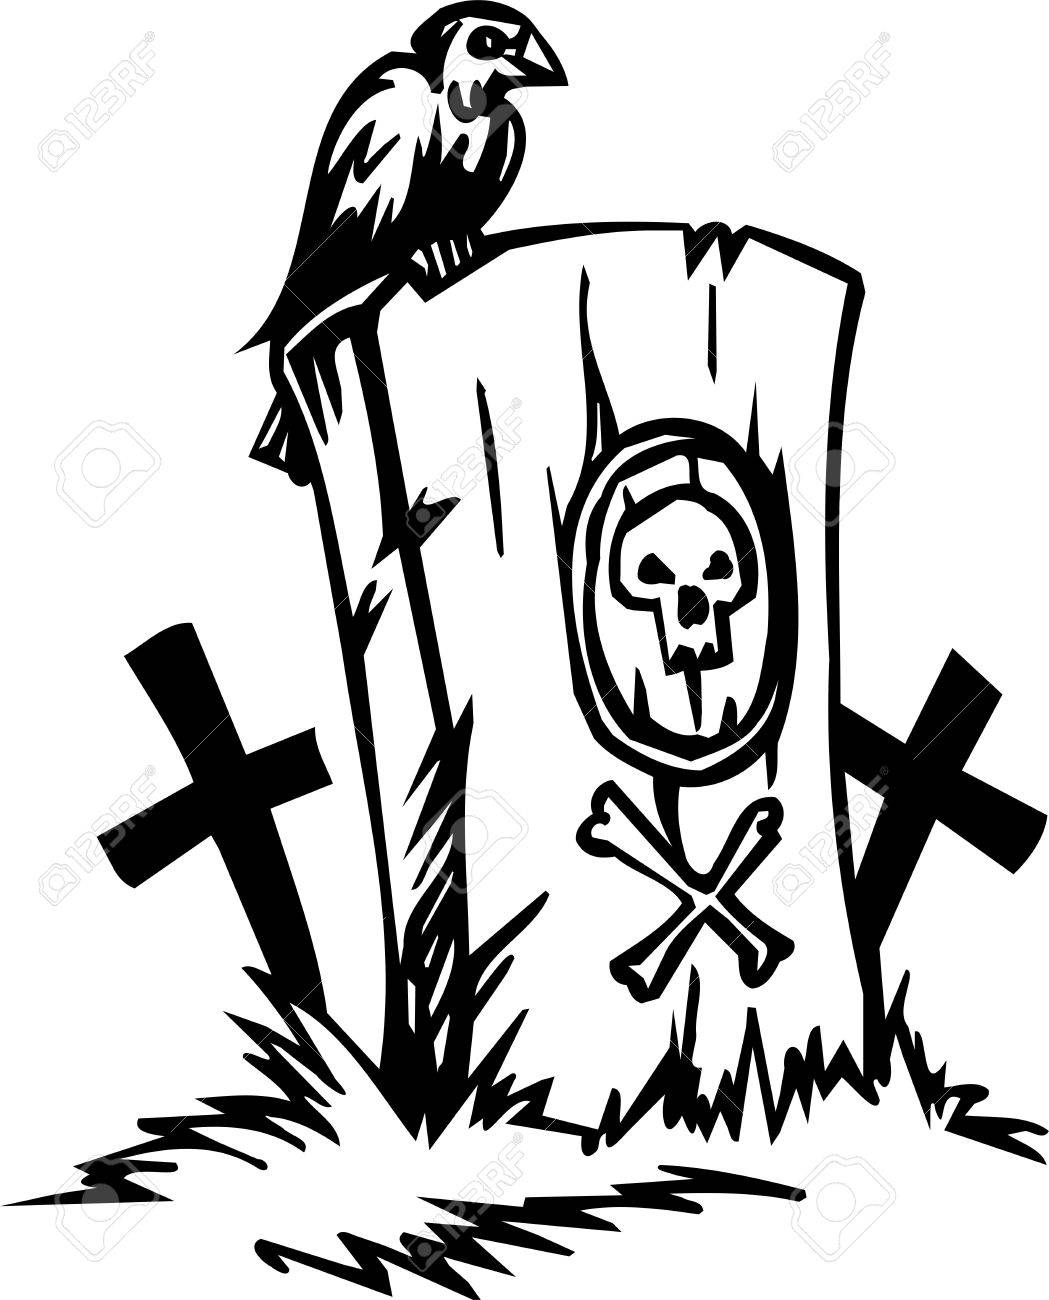 Grave - Halloween Set - vector illustration Stock Vector - 12491035